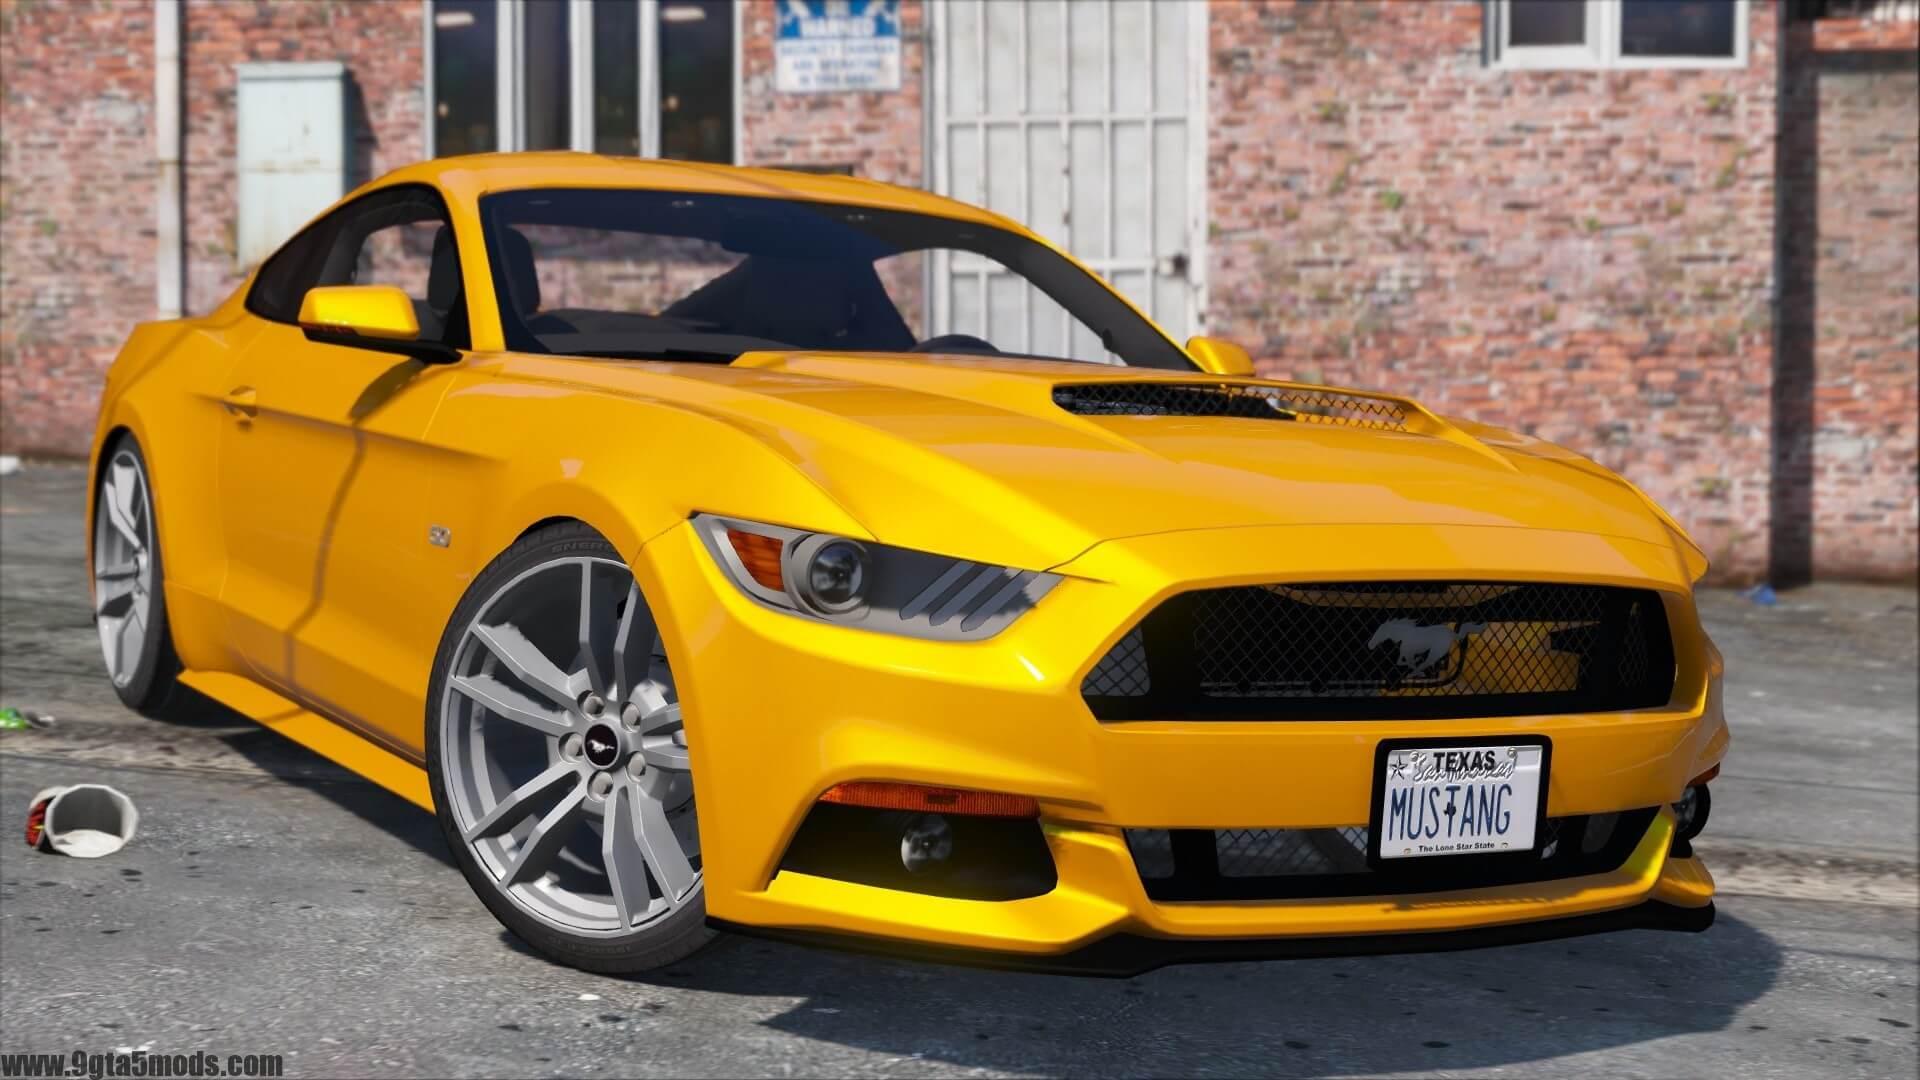 Mustang Games